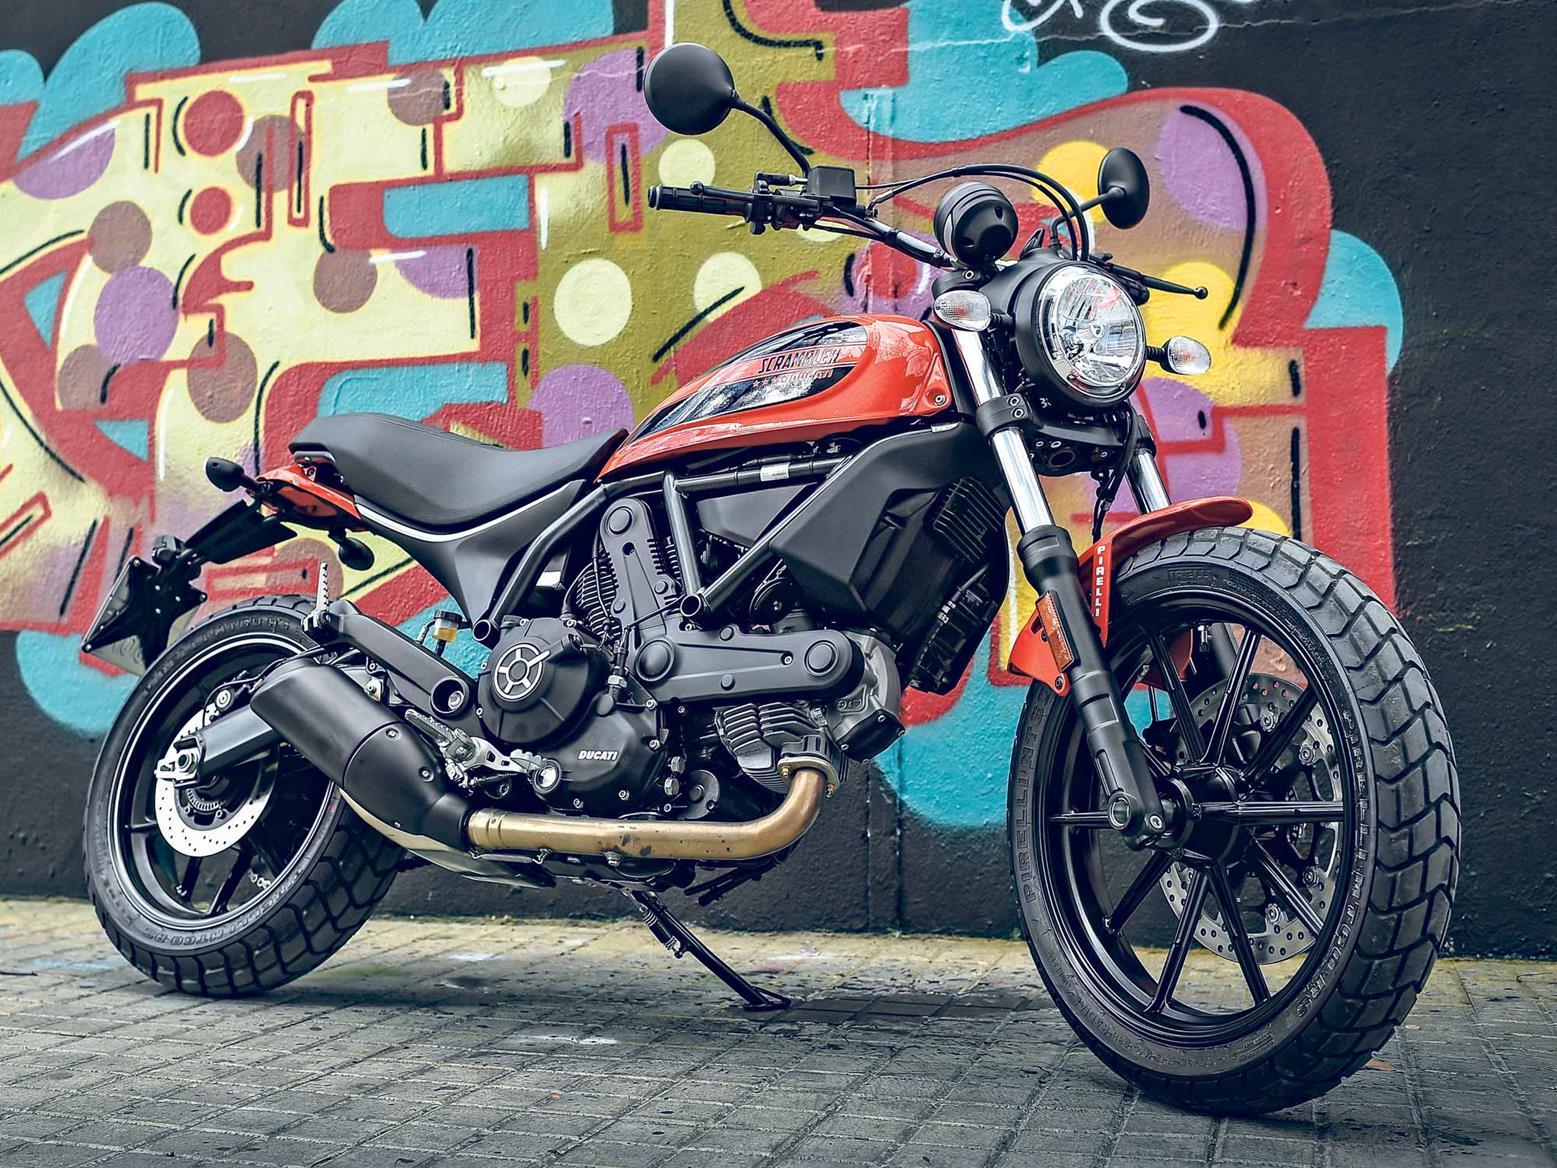 Ducati Scrambler Sixty2 side view